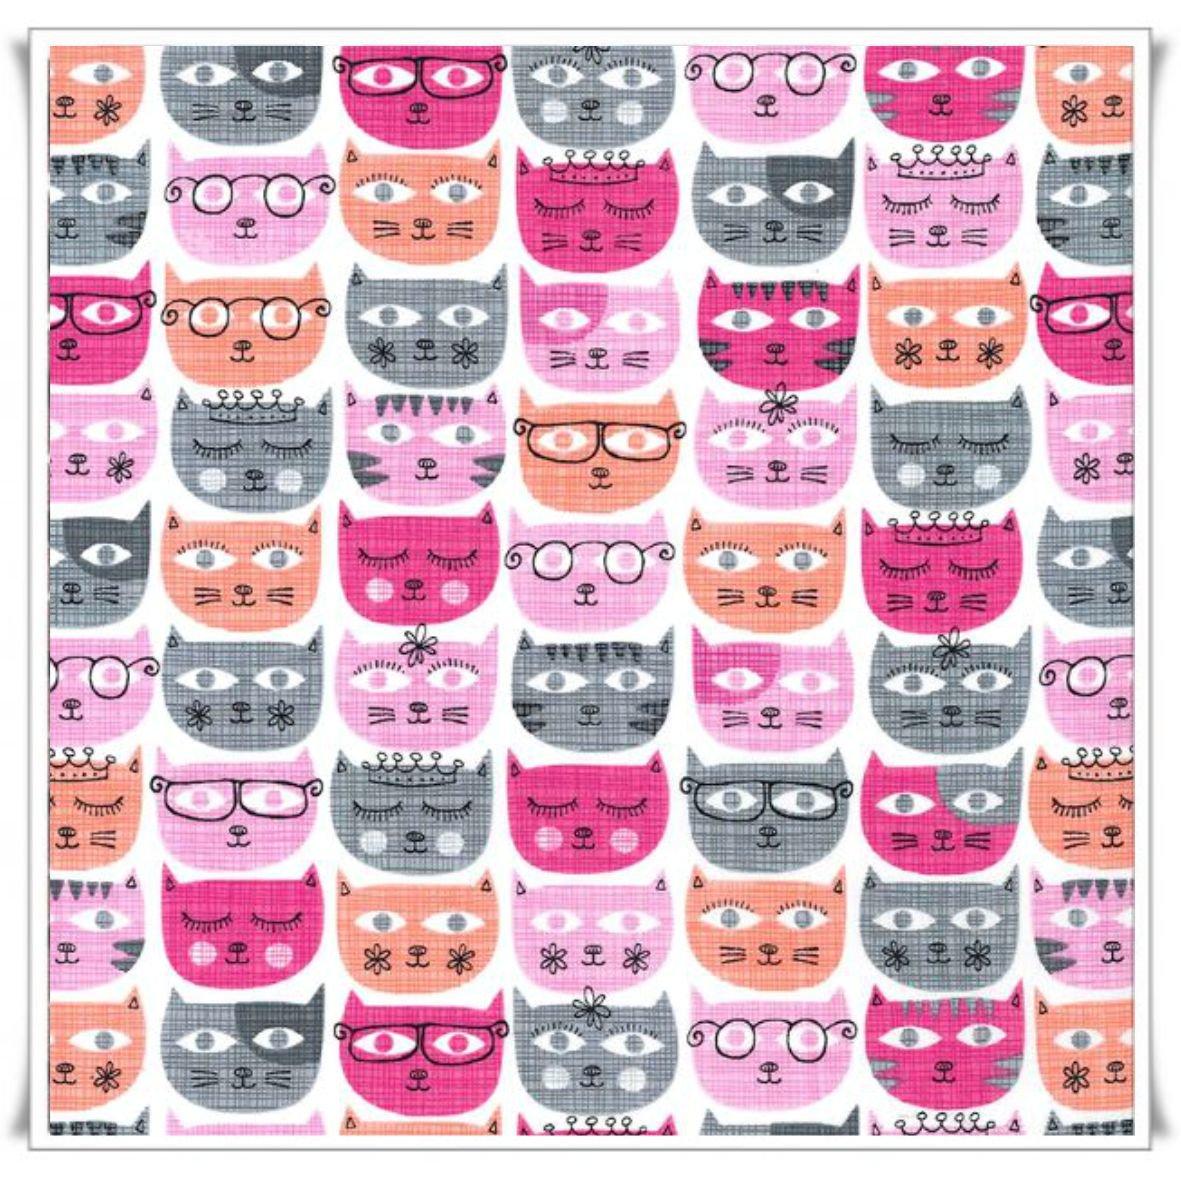 22 - SASSY CATS.jpg